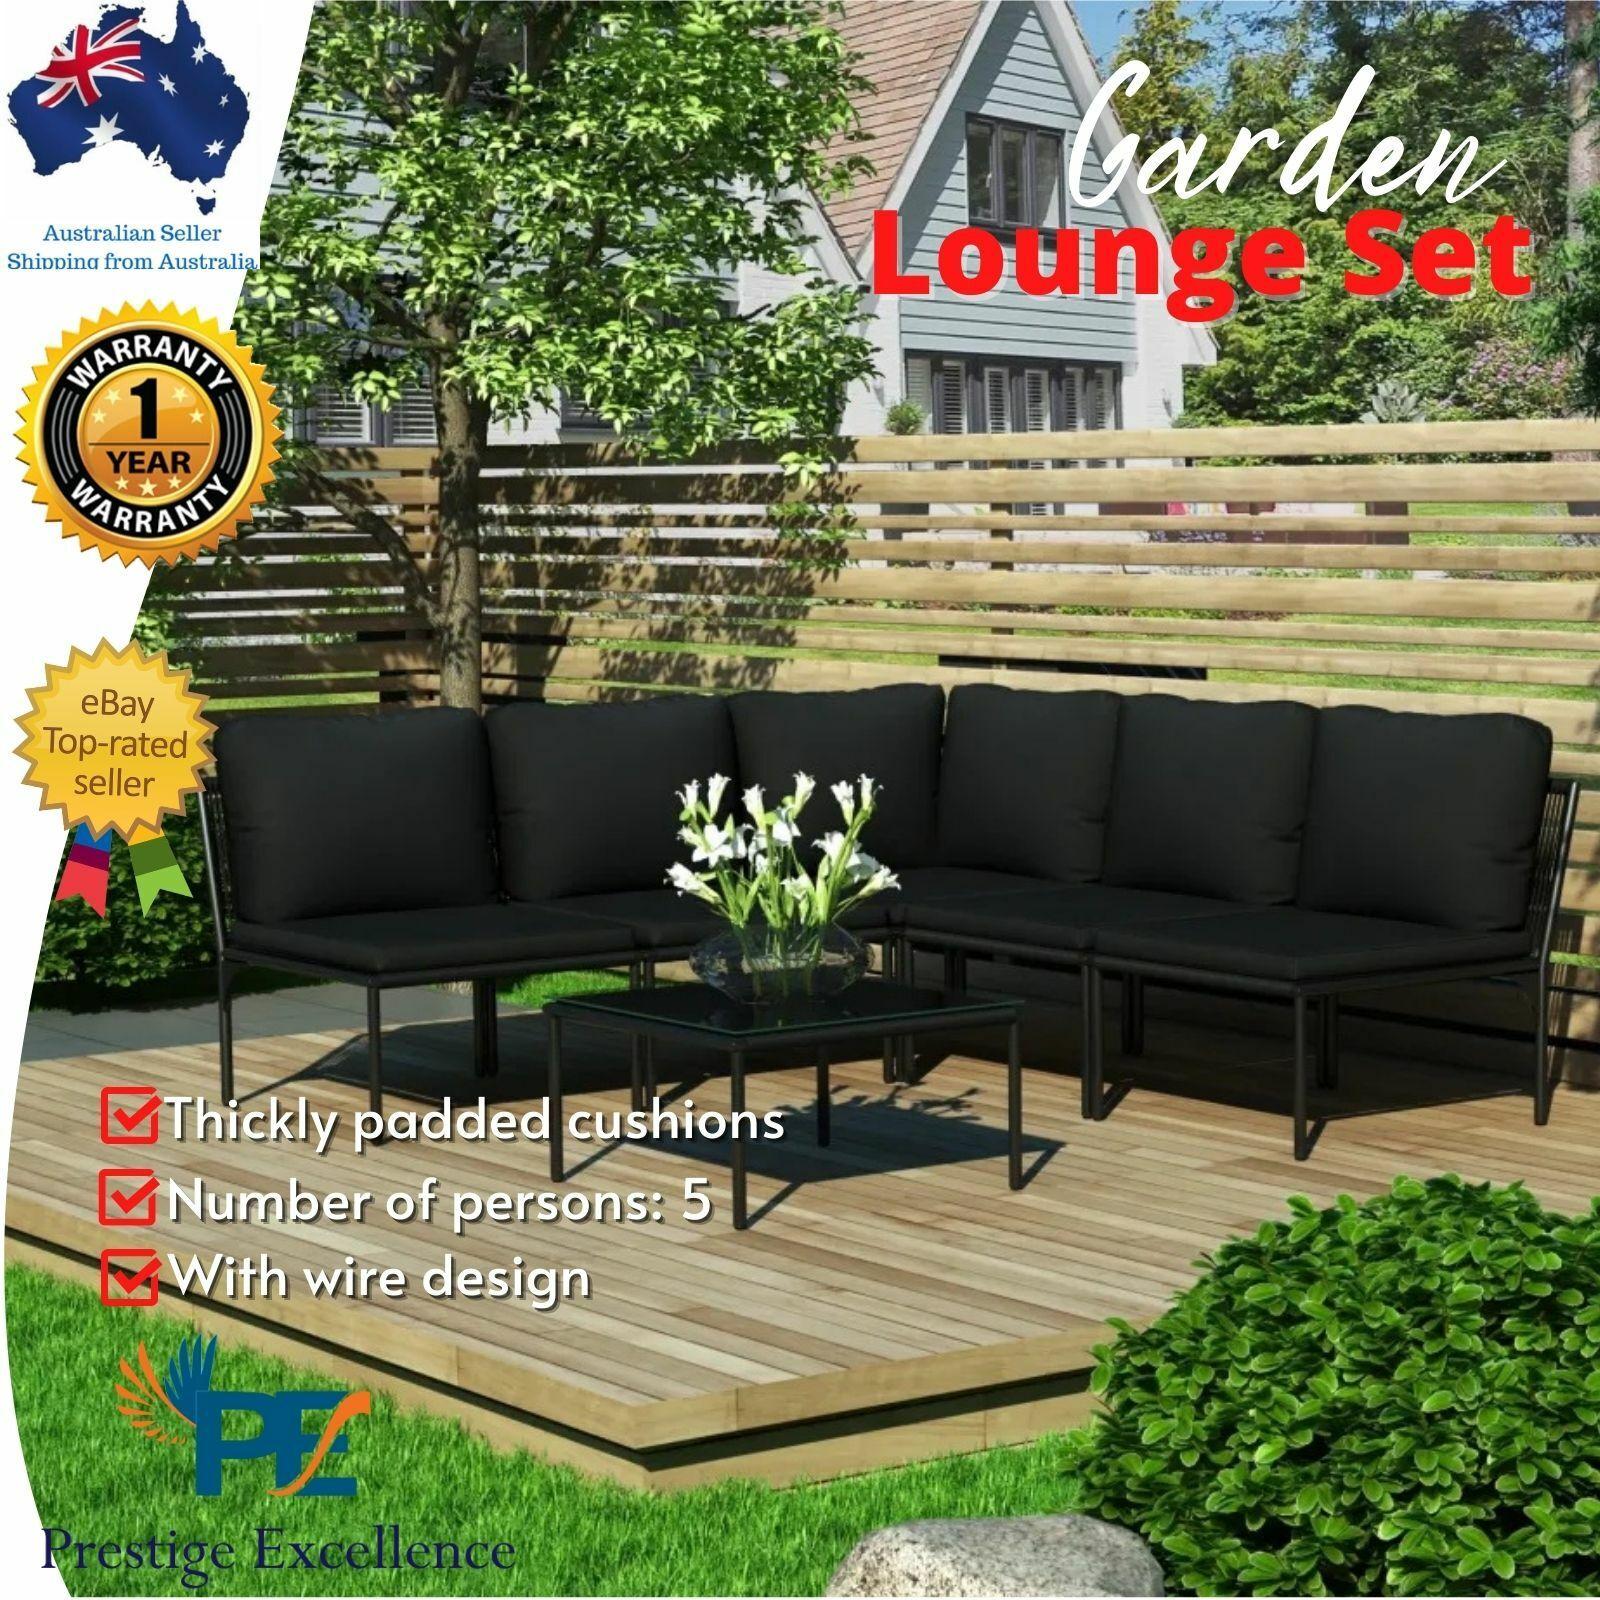 Garden Furniture - 6pc Outdoor Lounge Setting Garden Furniture Sofa Patio Table Chairs w/ Cushions